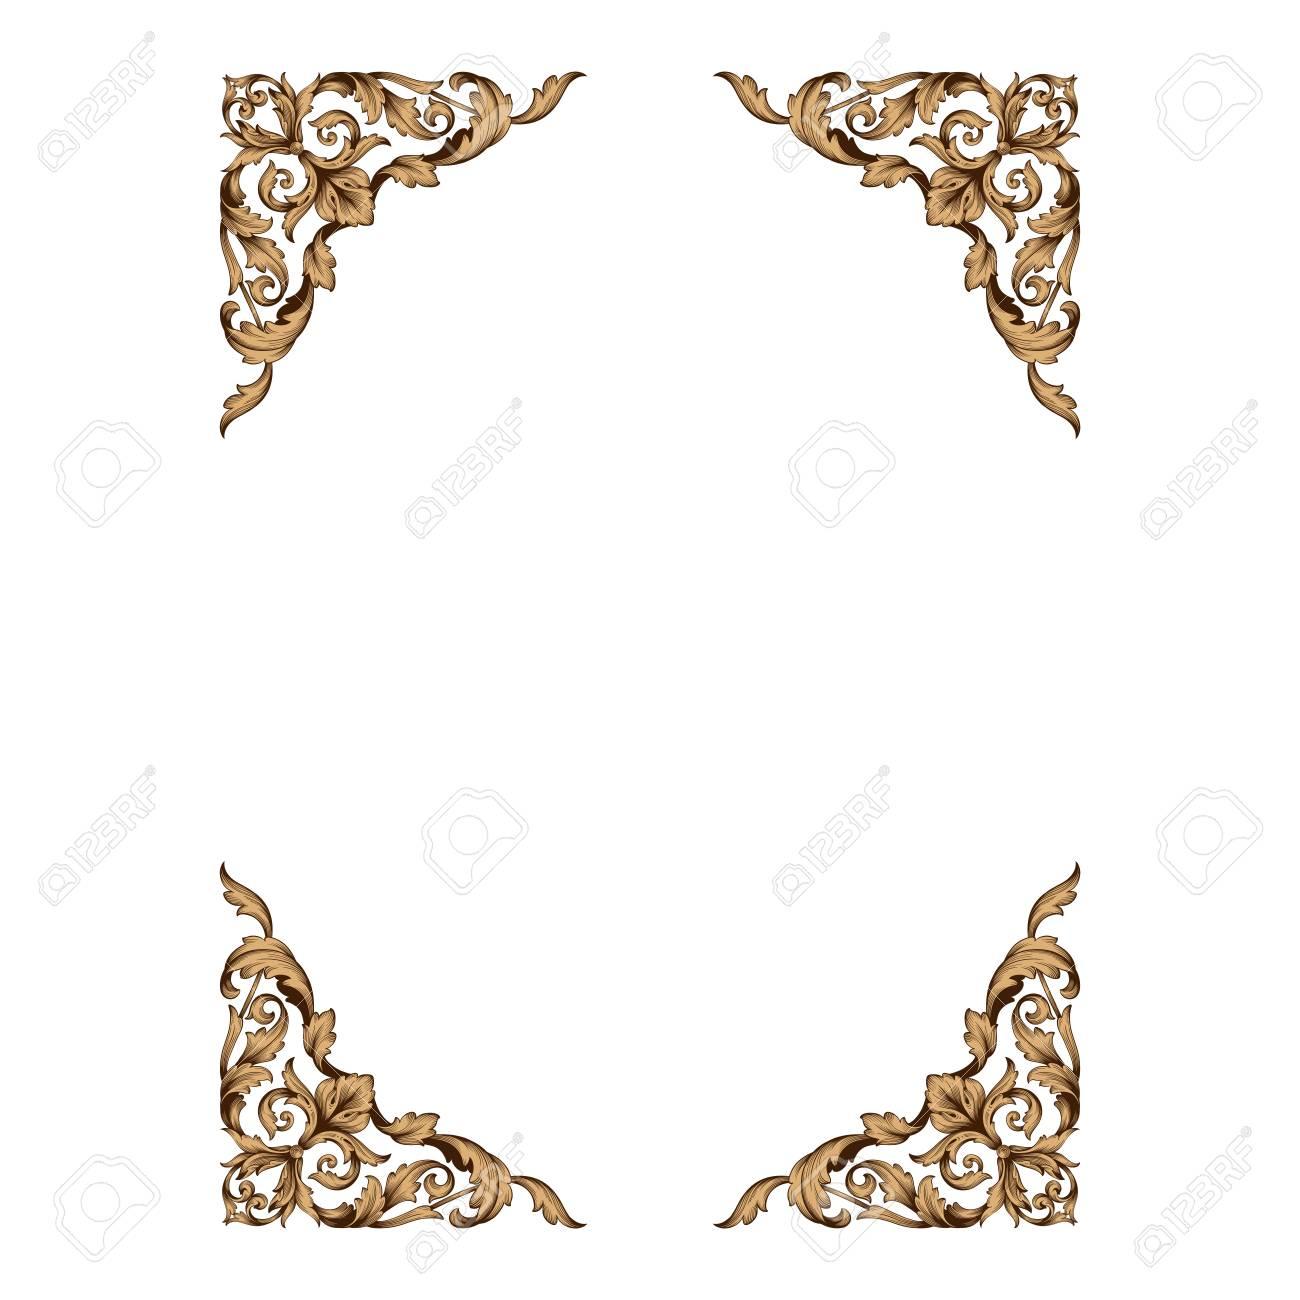 Decorative Line Gold Clipart baroque